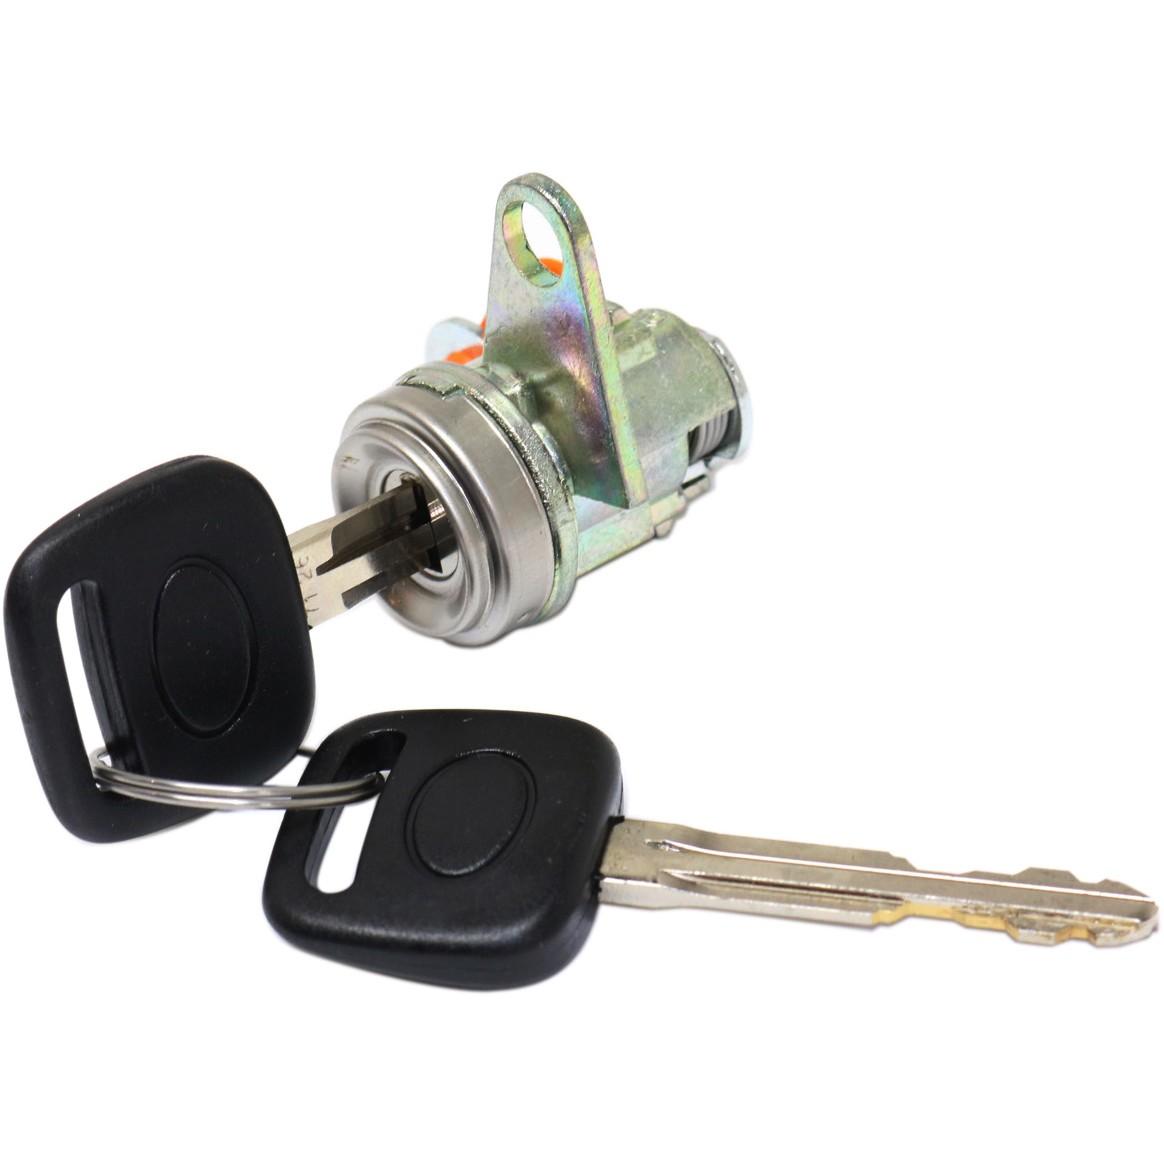 New-Door-Lock-Cylinders-Set-of-2-Driver-amp-Passenger-Side-LH-RH-7720152060-Pair thumbnail 2